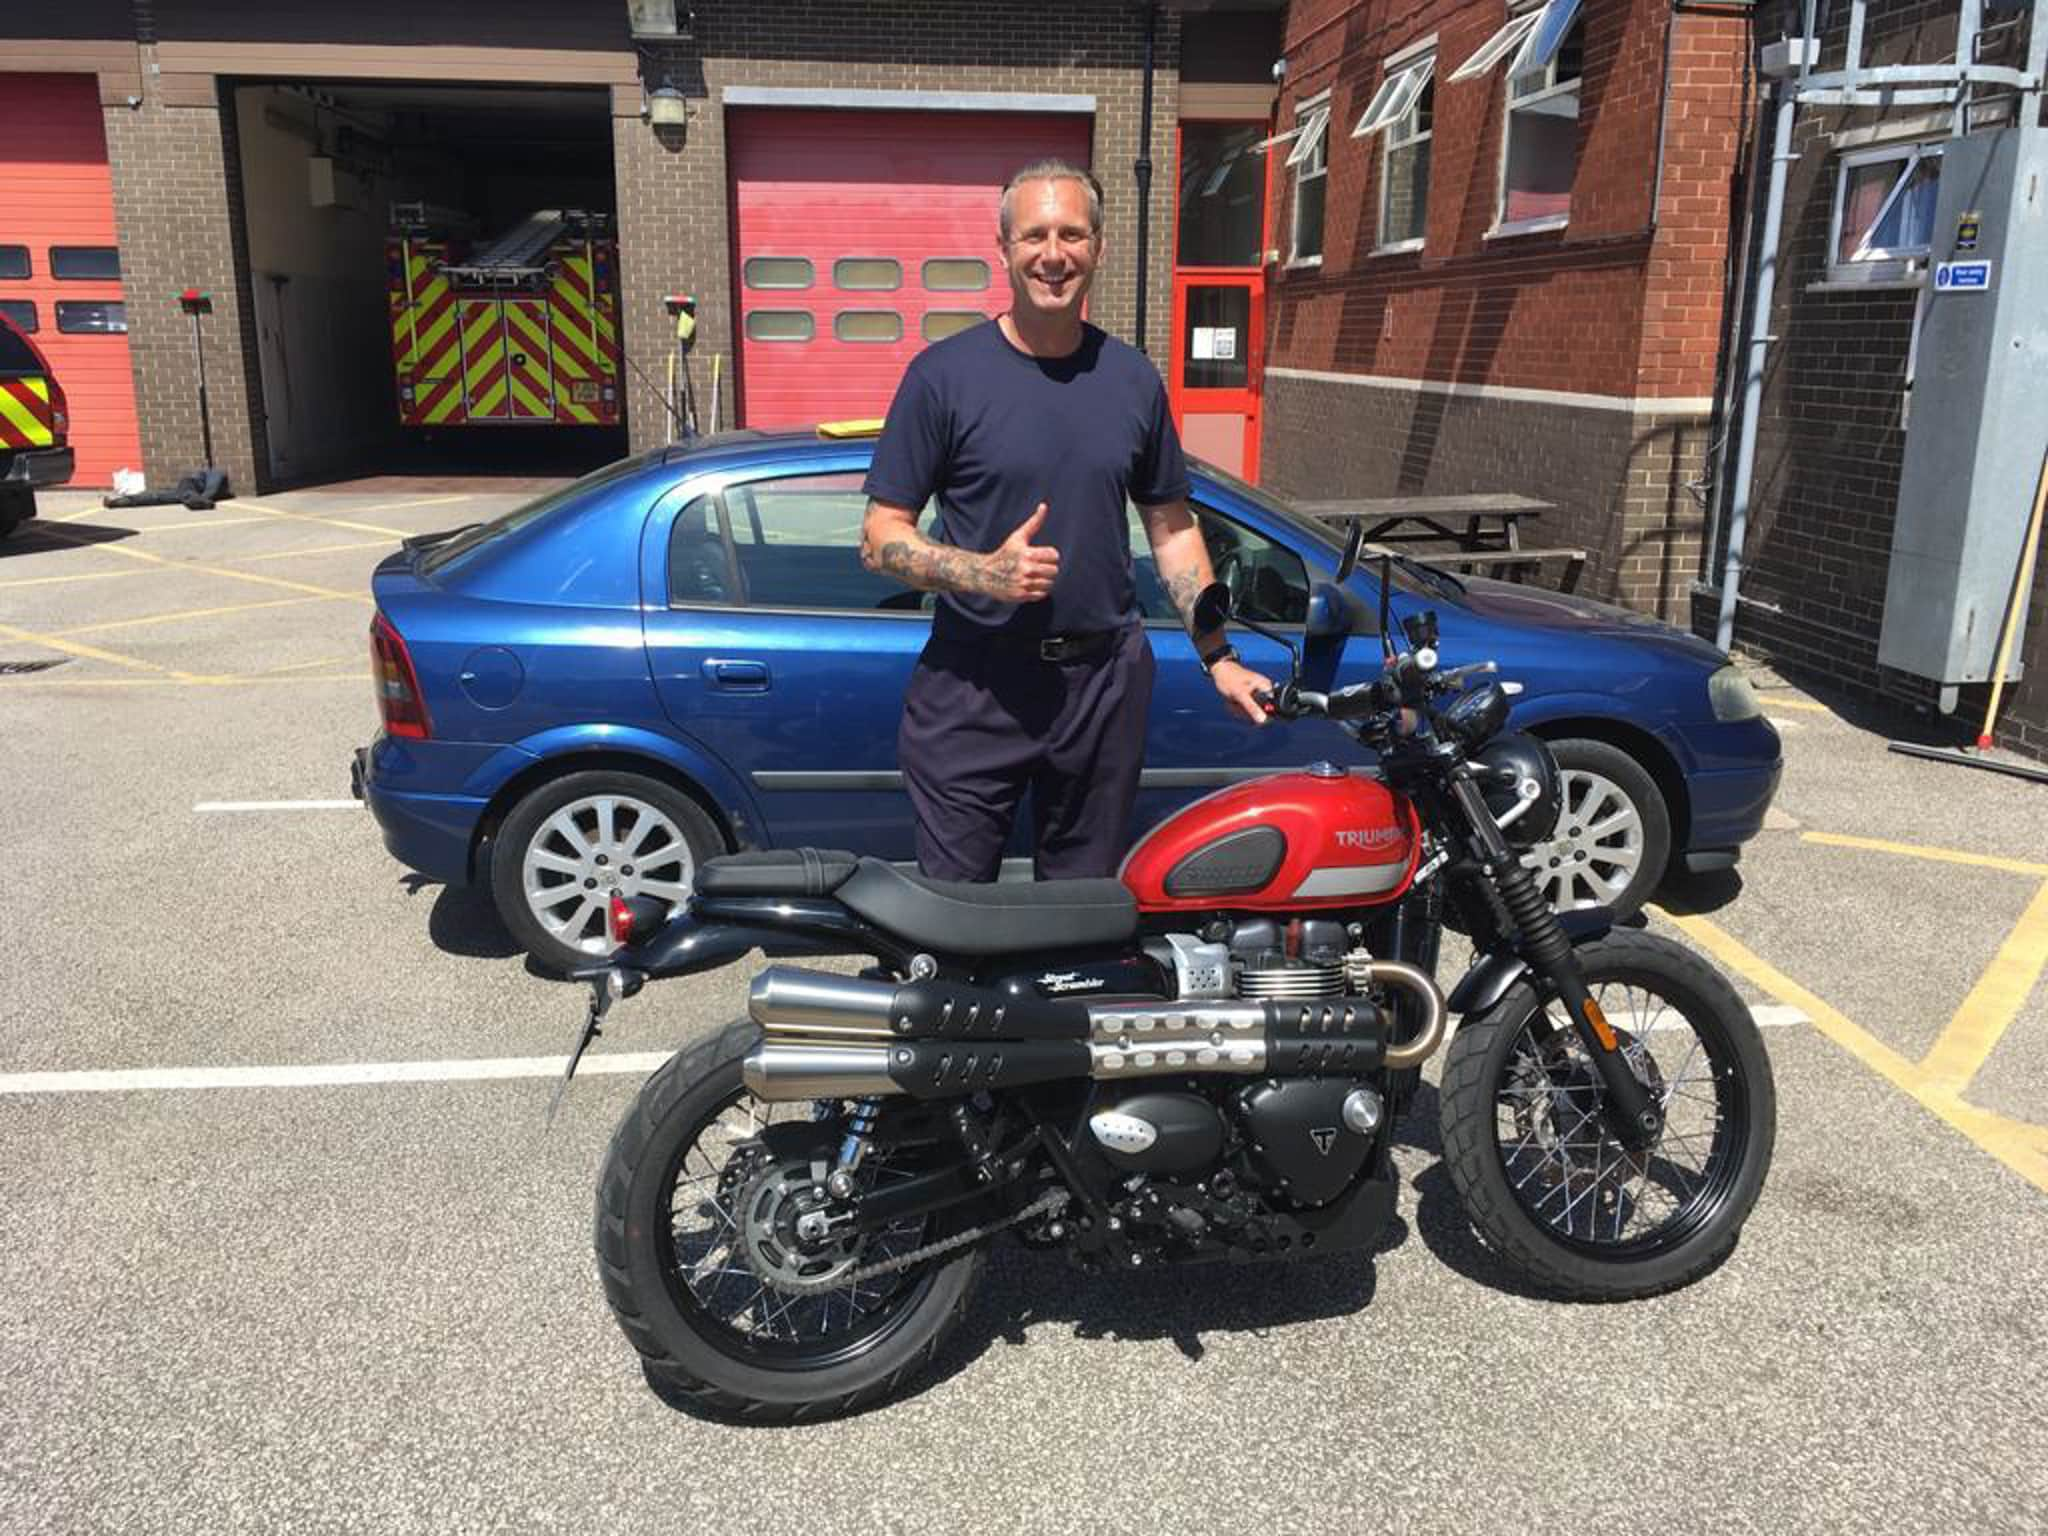 Winner Mark Leatherland of a 2017 Triumph Street Scrambler 900 - 14th June